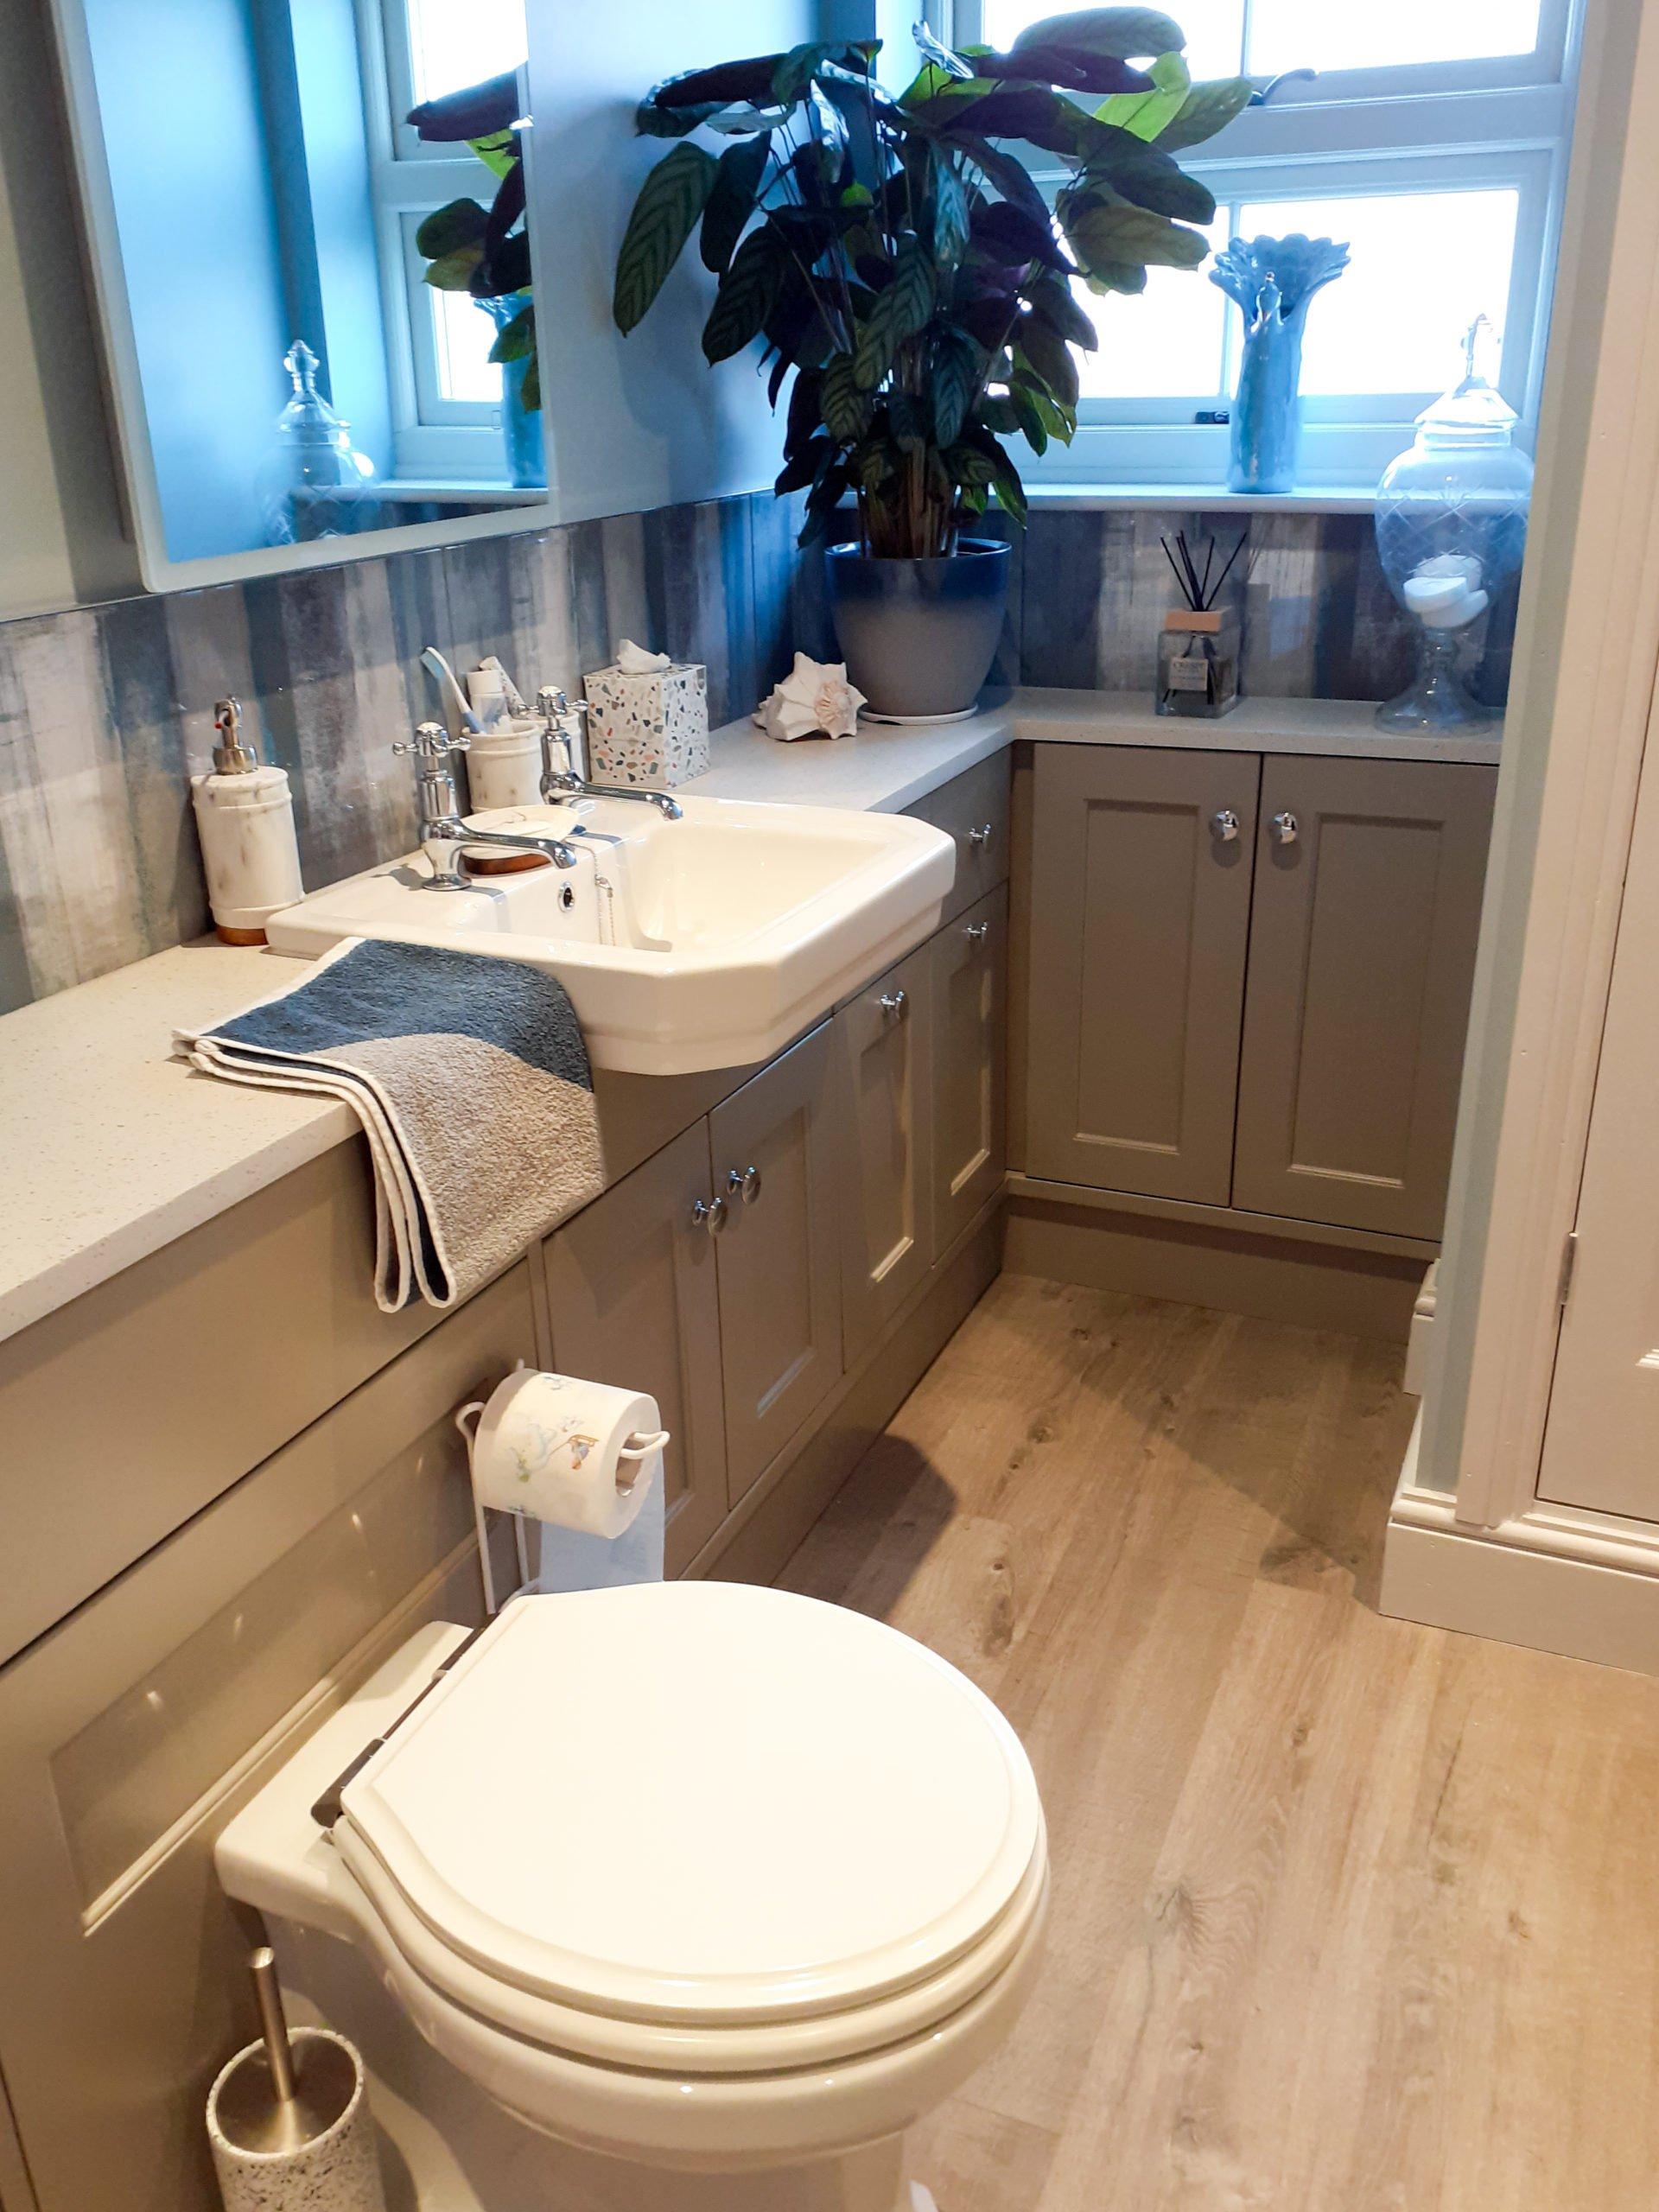 Roper Rhodes Harrow toilet and matching basin